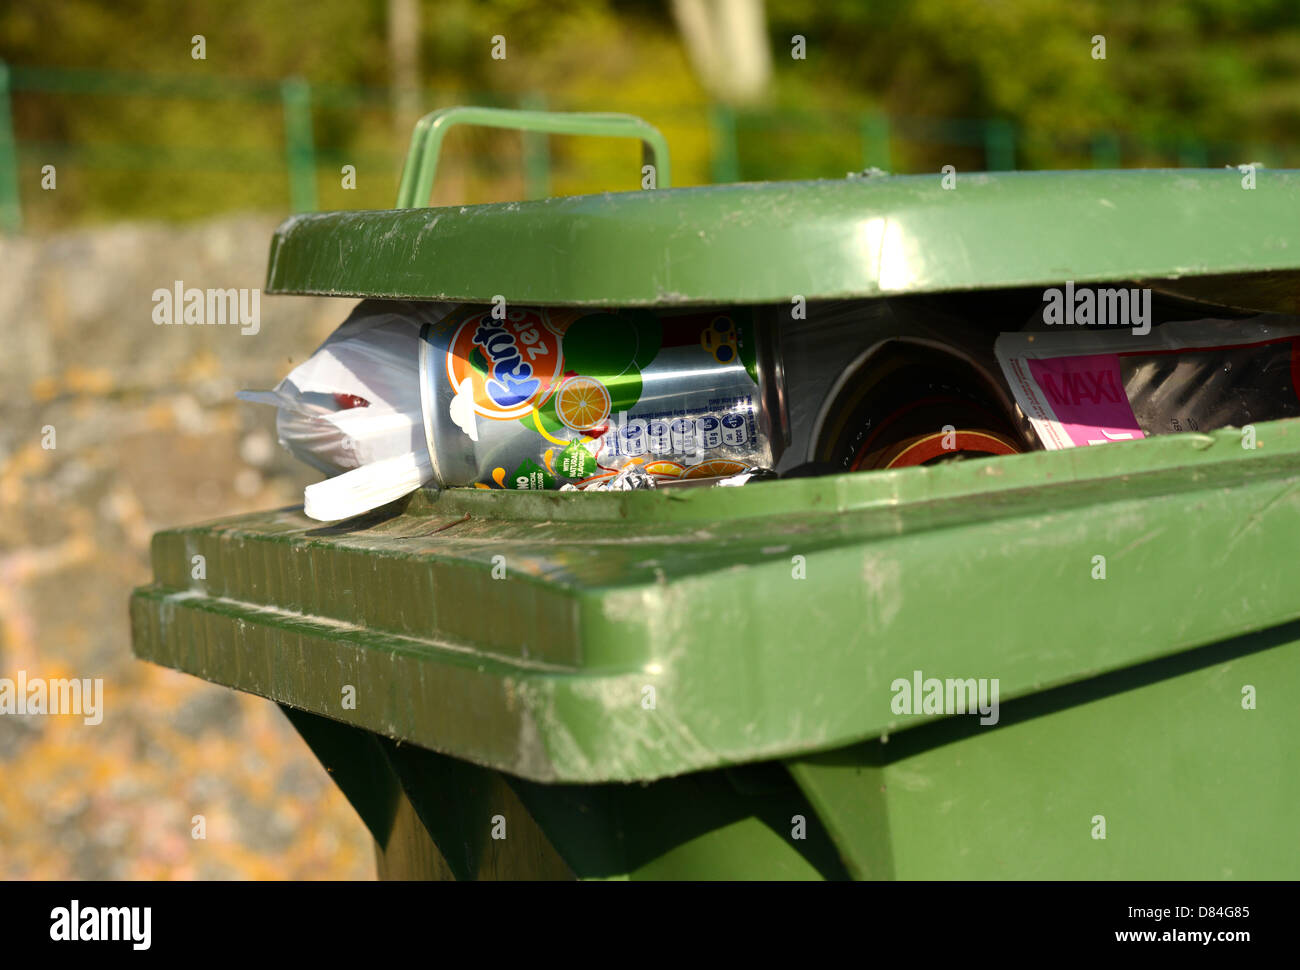 wheelie bin overflowing with rubbish - Stock Image